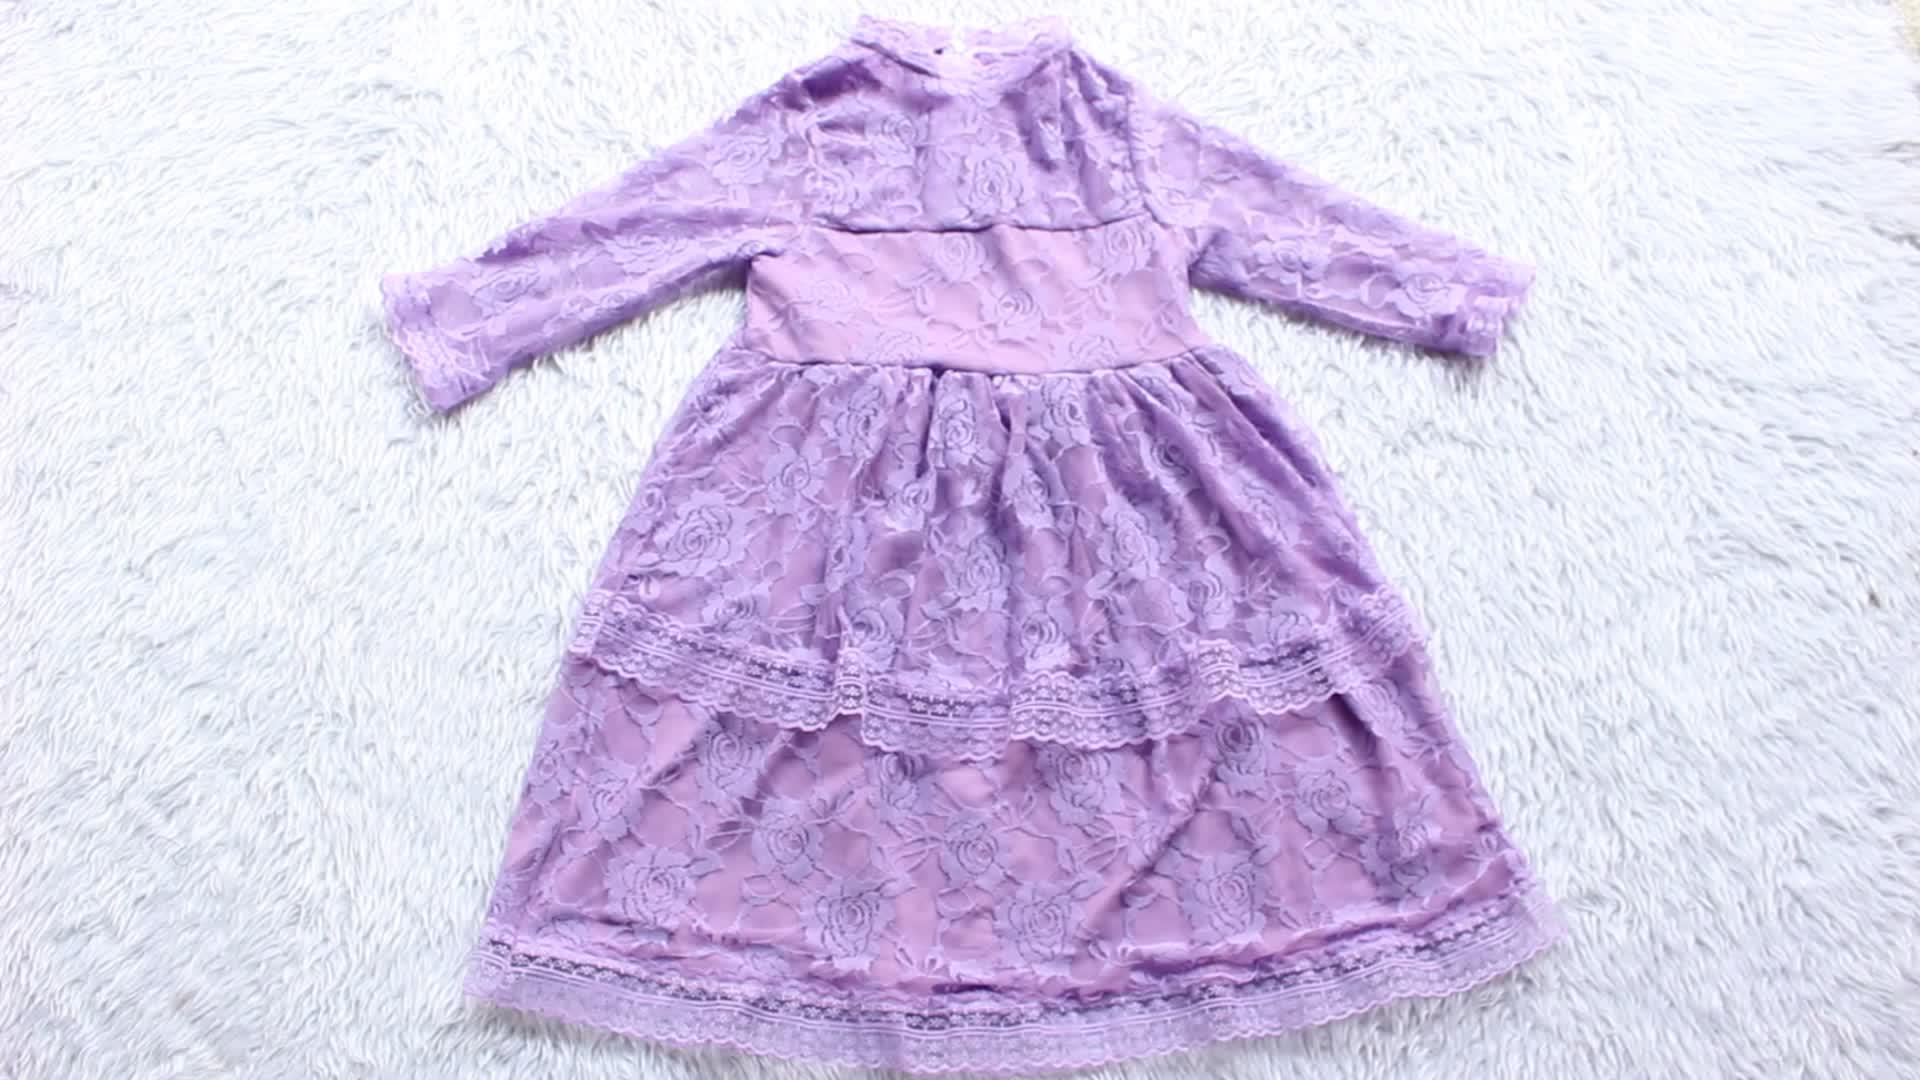 Vintage bloemen rok baby dress ontwerp westerse kinderkleding 12 jaar oud meisje modellen kinderen groothandel gesmokte meisjes jurken